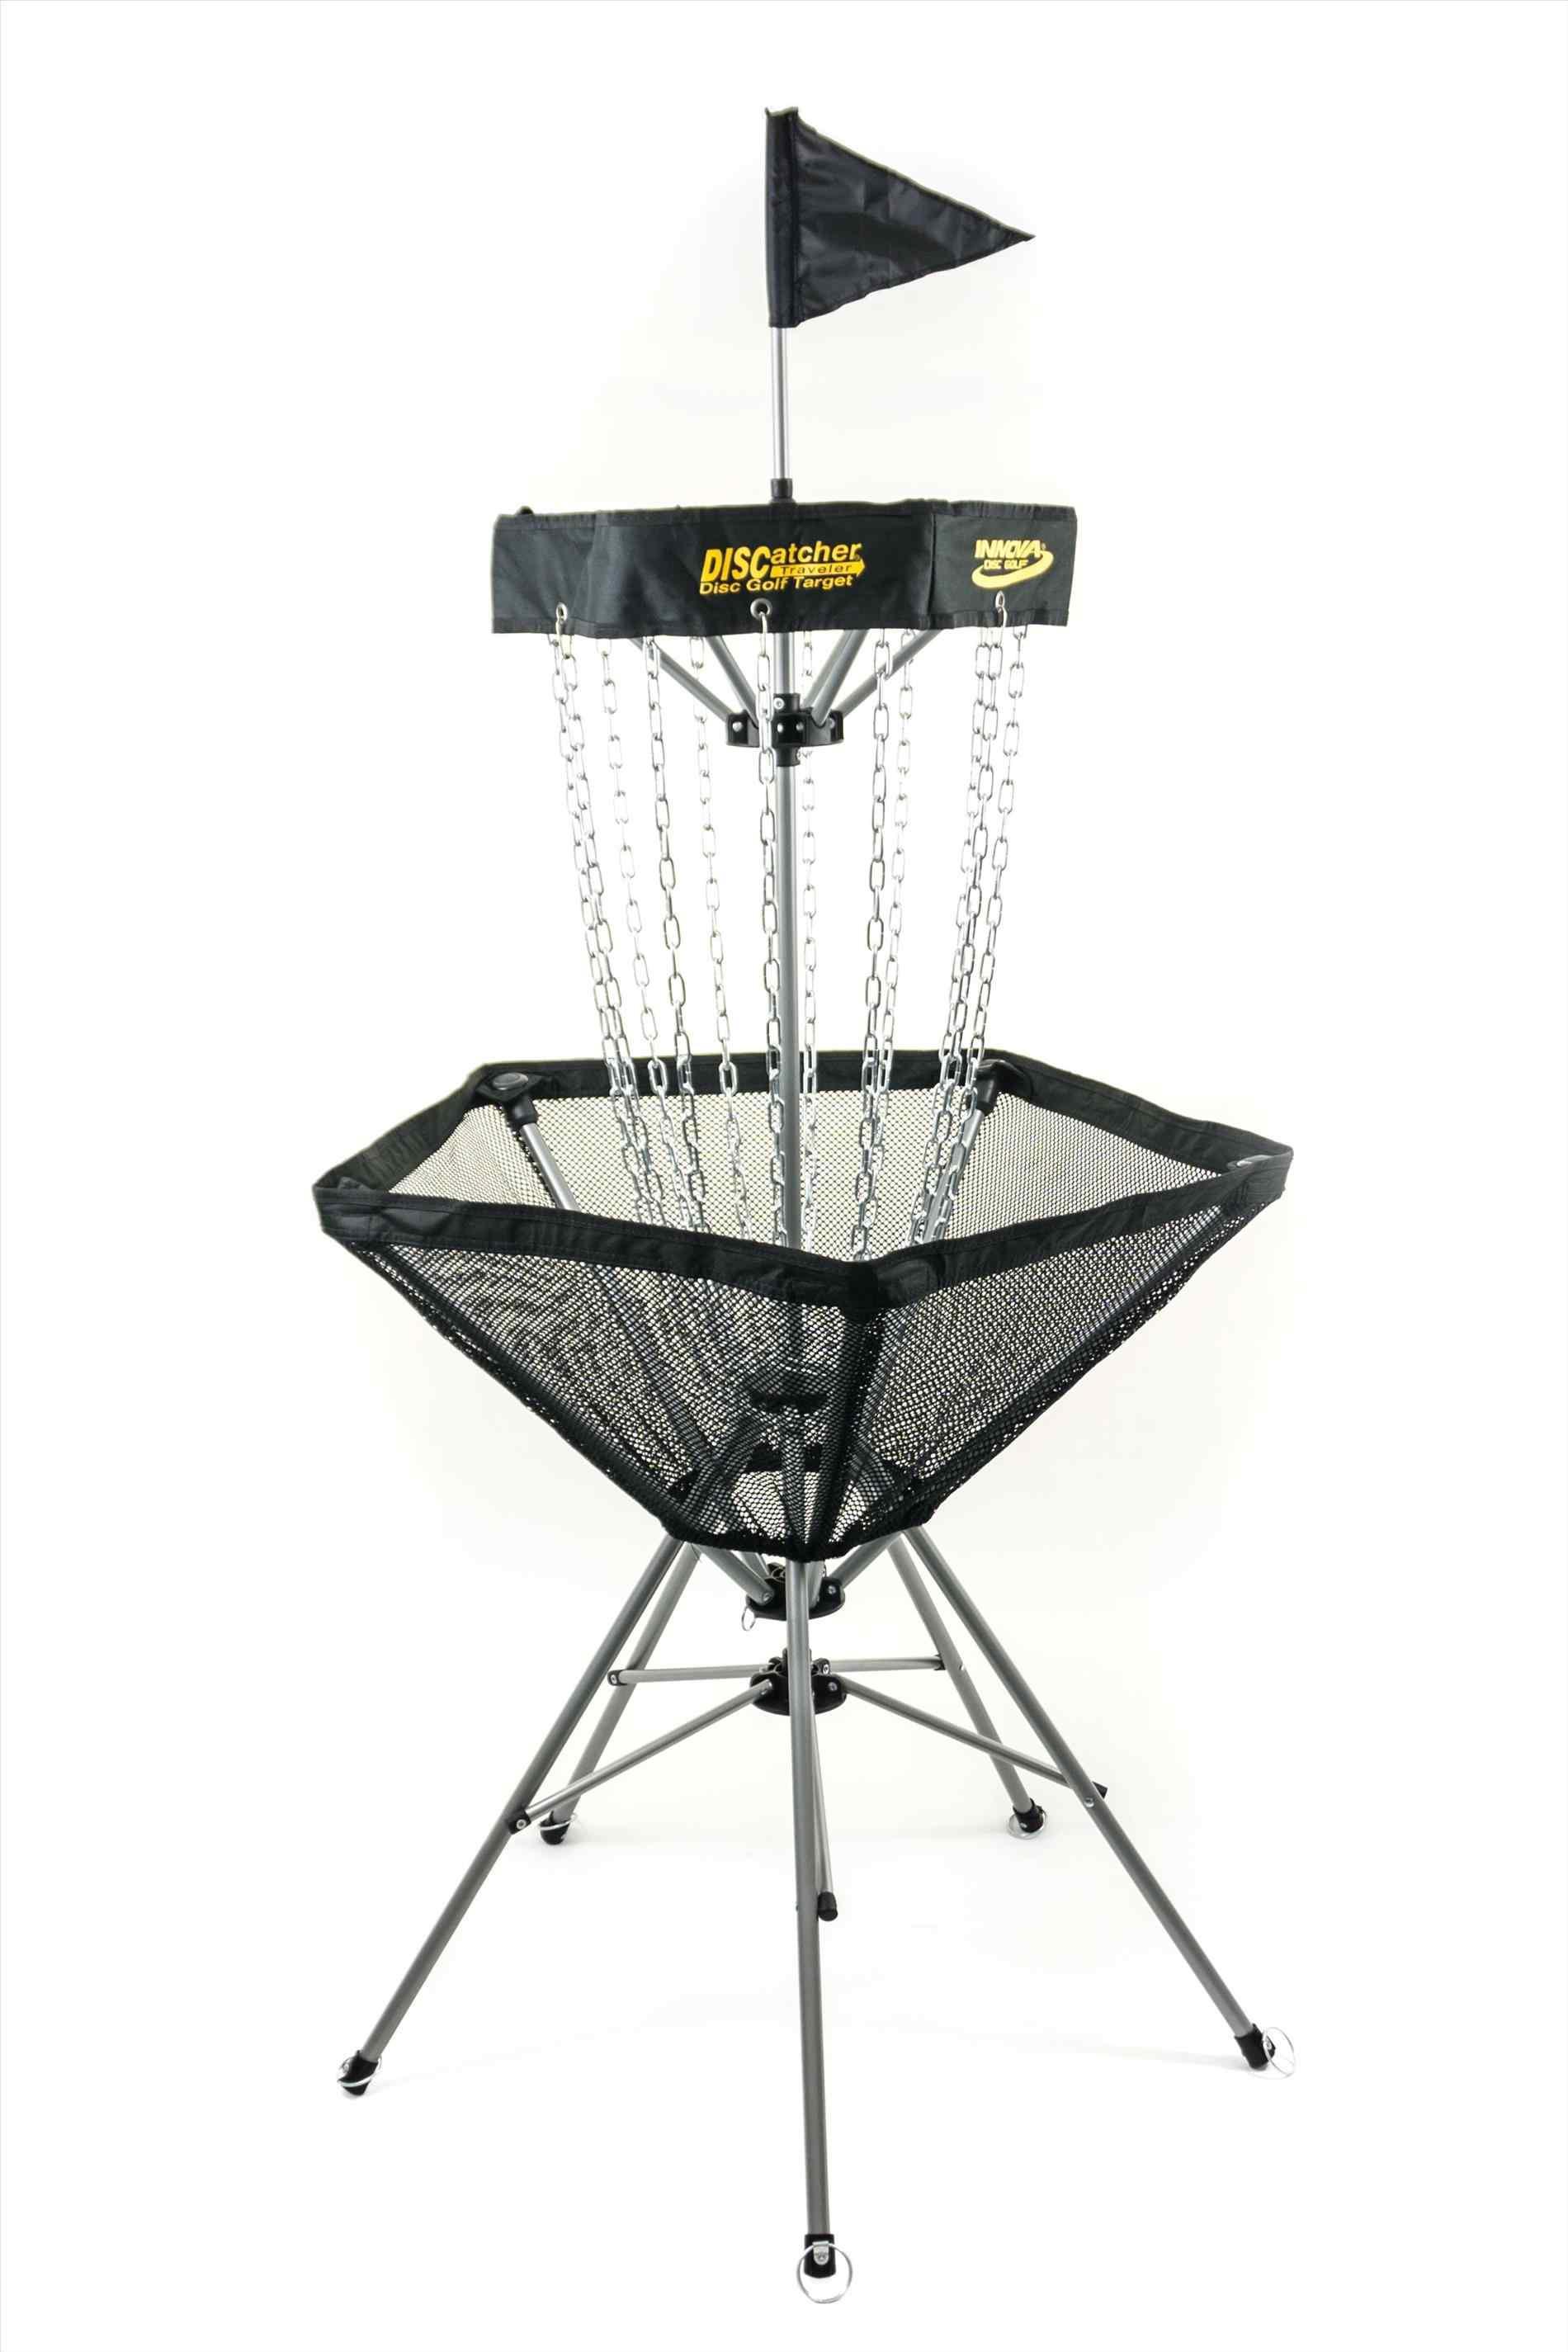 1900x2850 Disc Disc Golf Basket Black And White Golf Basket Flying Frisbee